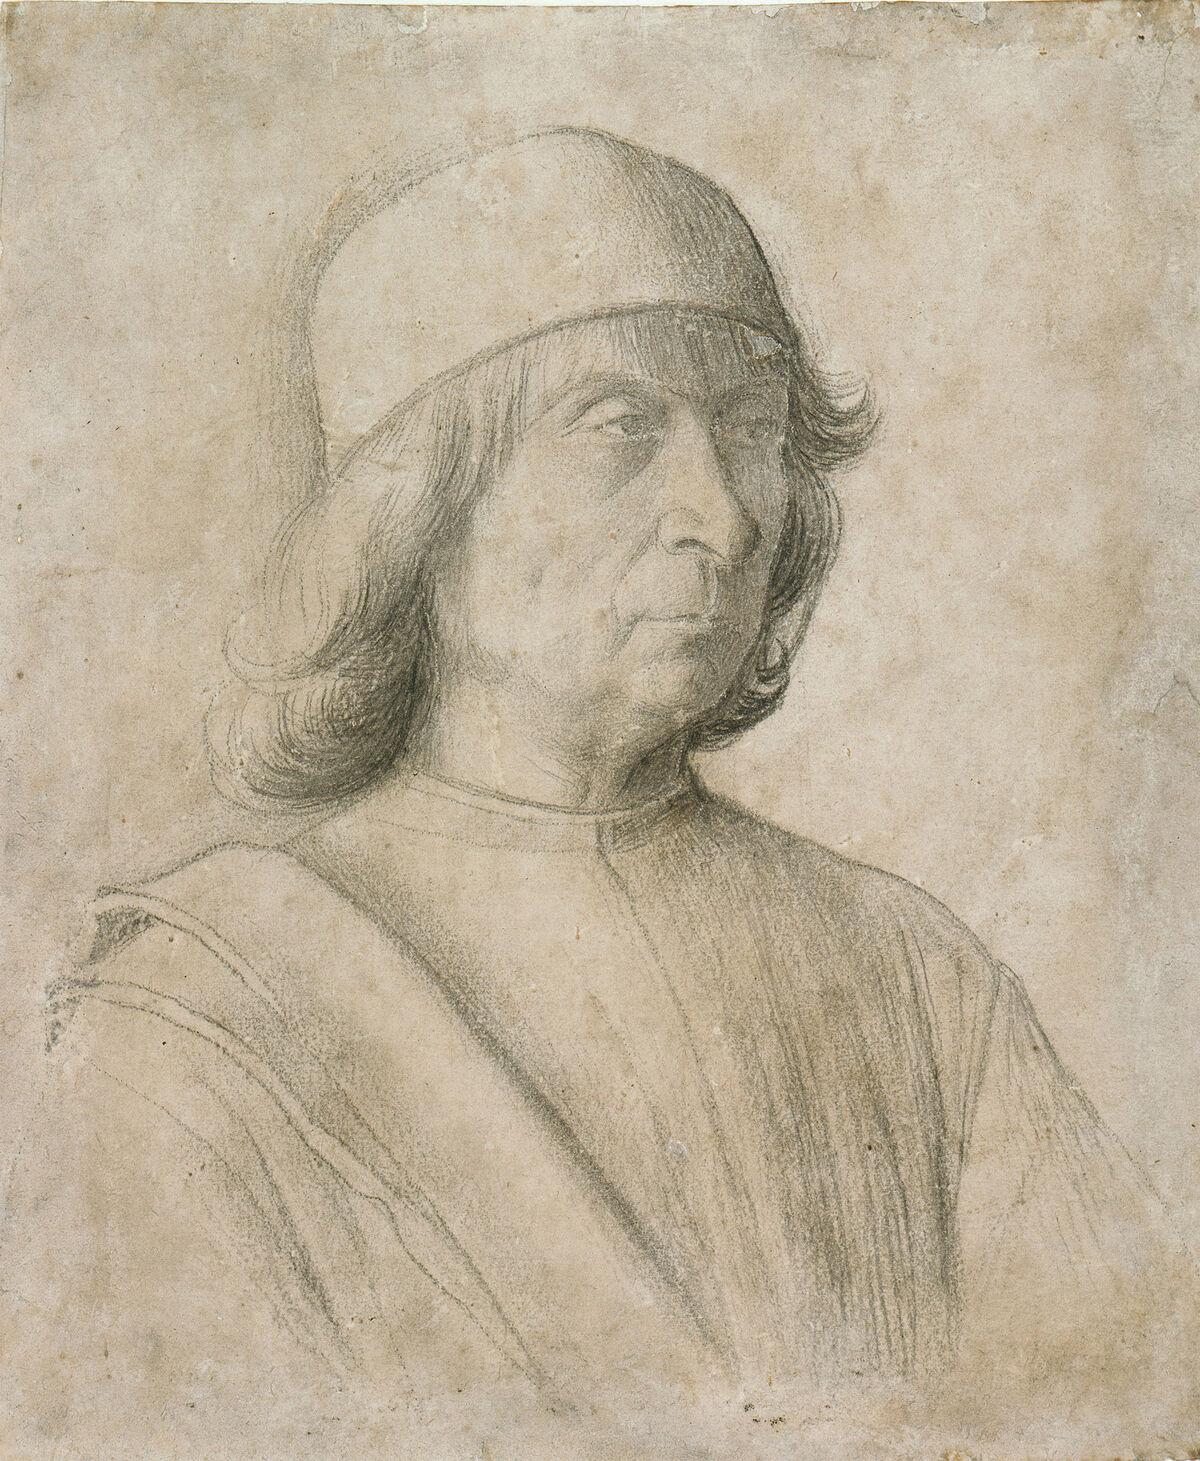 9b2d0cb3334 How Gentile Bellini s Portrait of a Sultan Helped End a War - Artsy